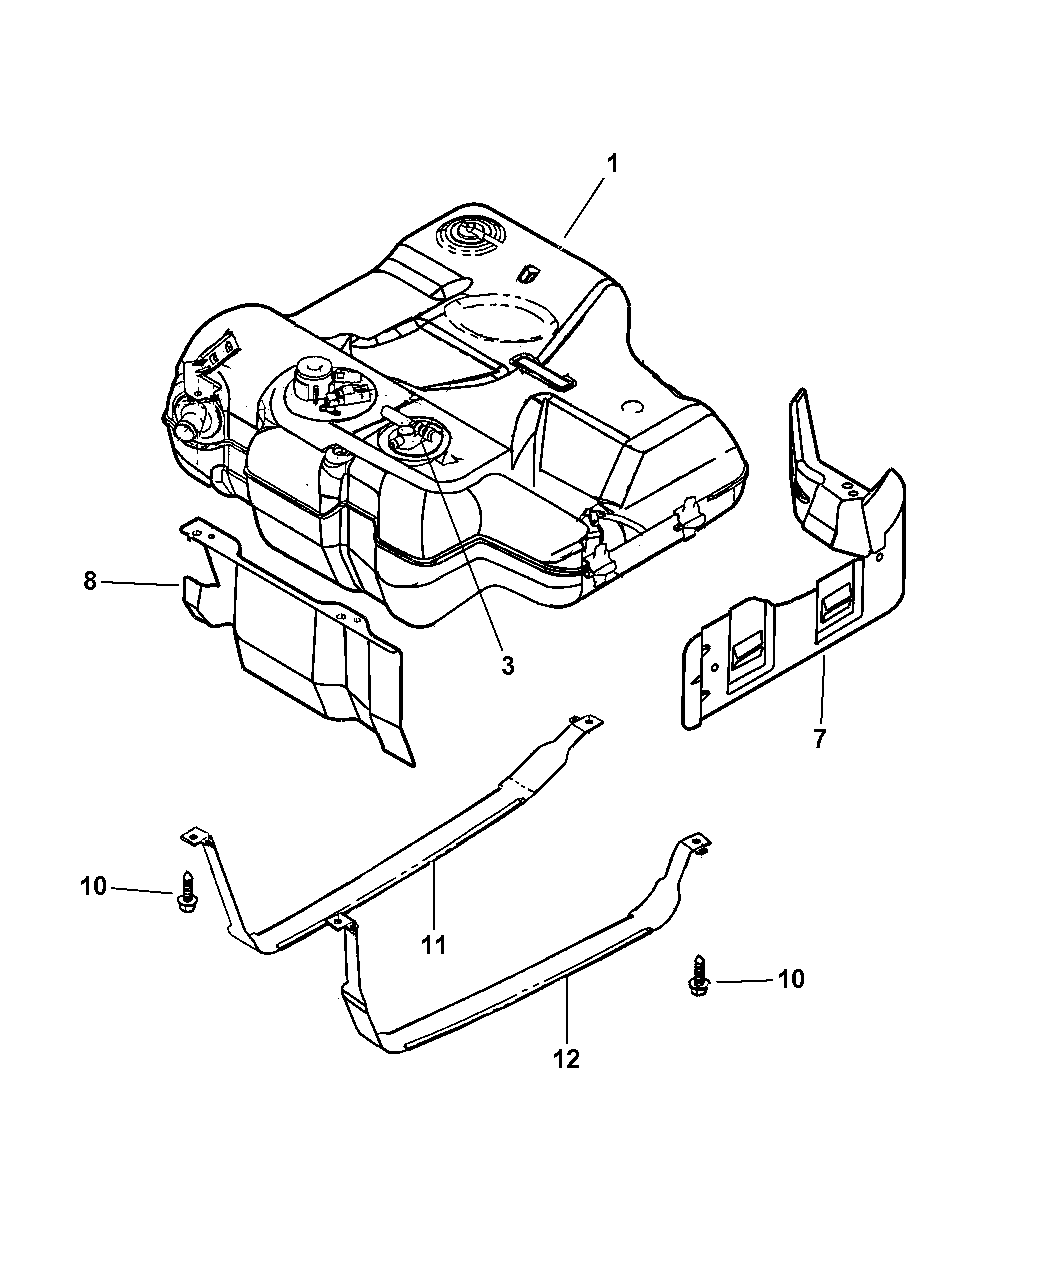 2000 chrysler concorde fuel tank - mopar parts giant 1993 chrysler concorde wiring diagram 2000 chrysler concorde wiring diagram #12